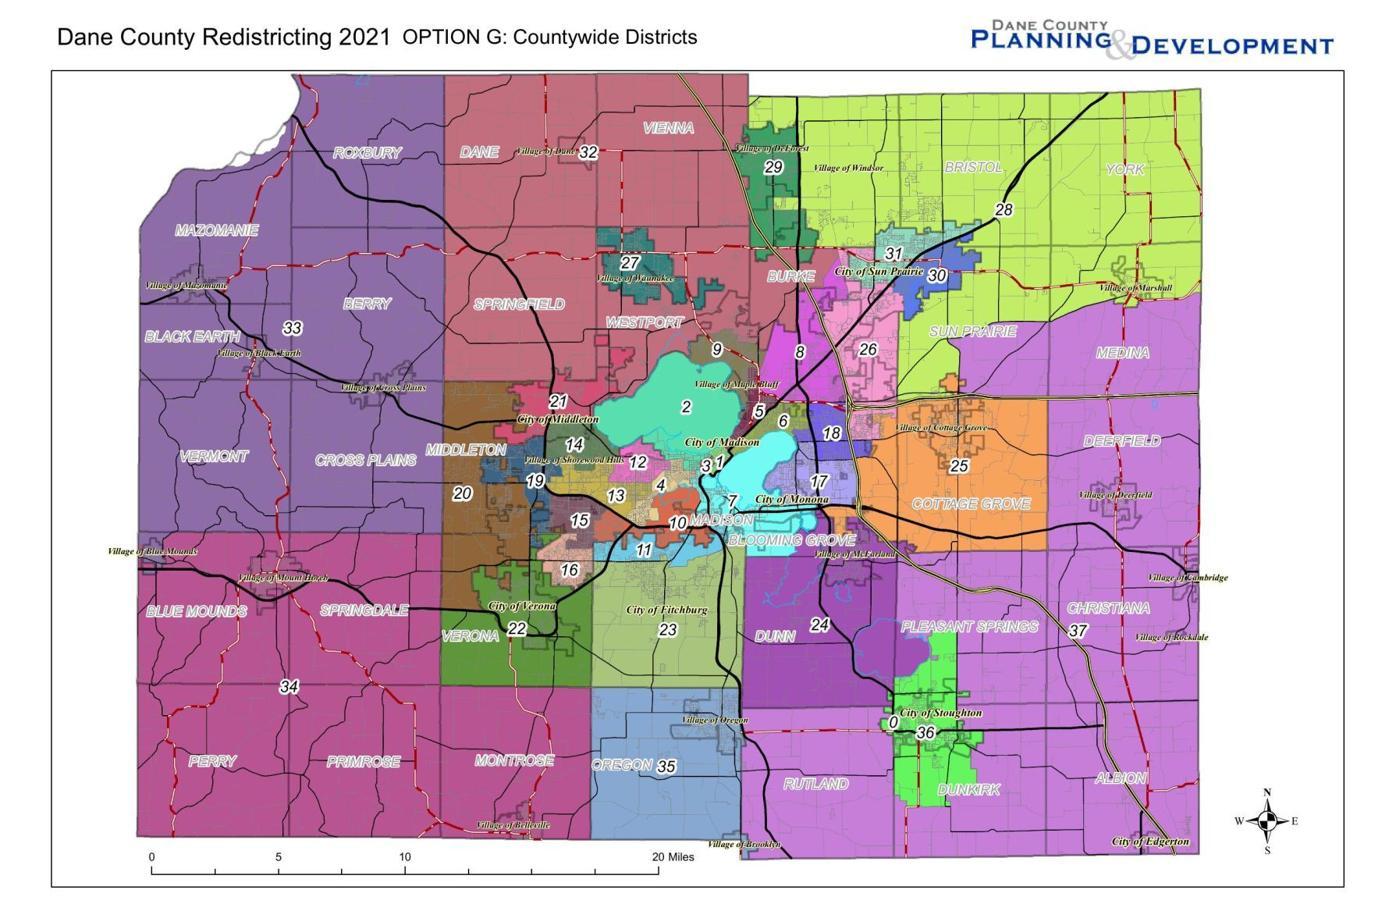 Dane County Redistricting Map Option G.pdf